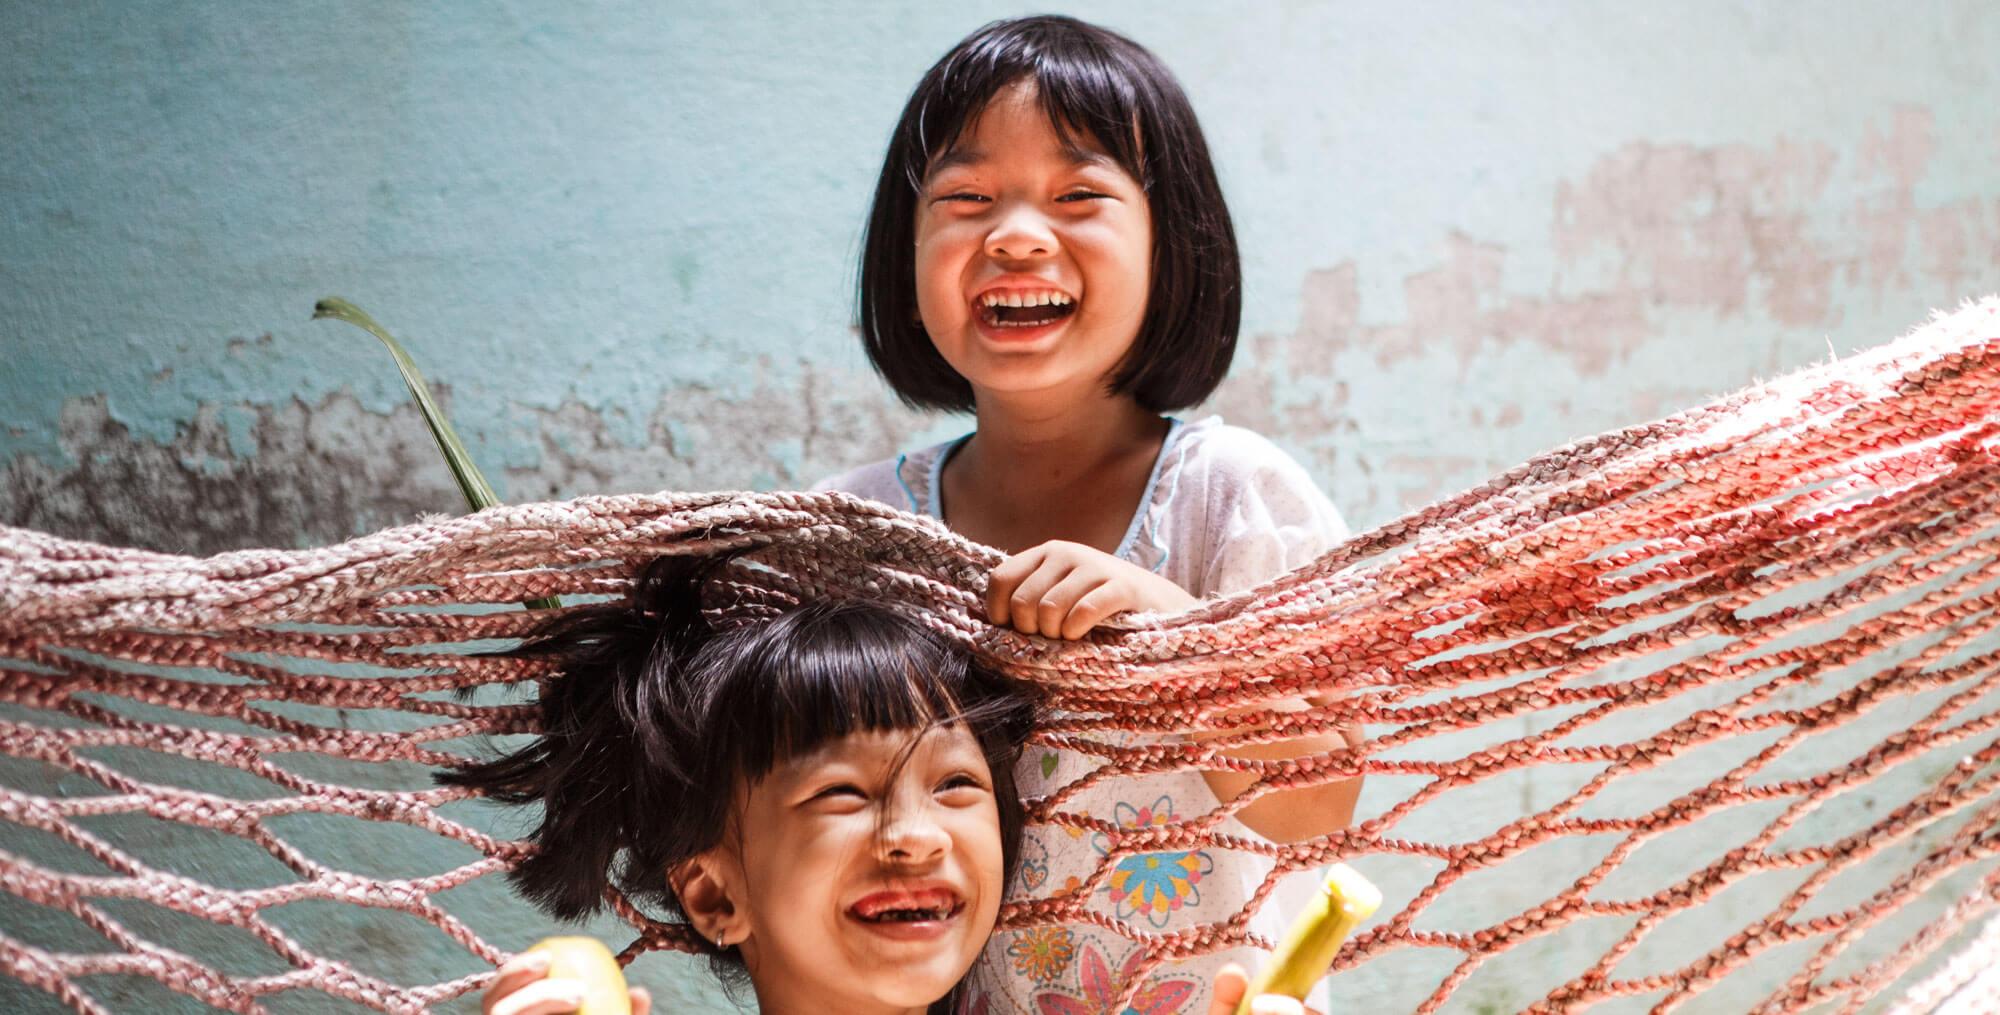 Rockefeller Foundation, Vietnam, flood risk, children